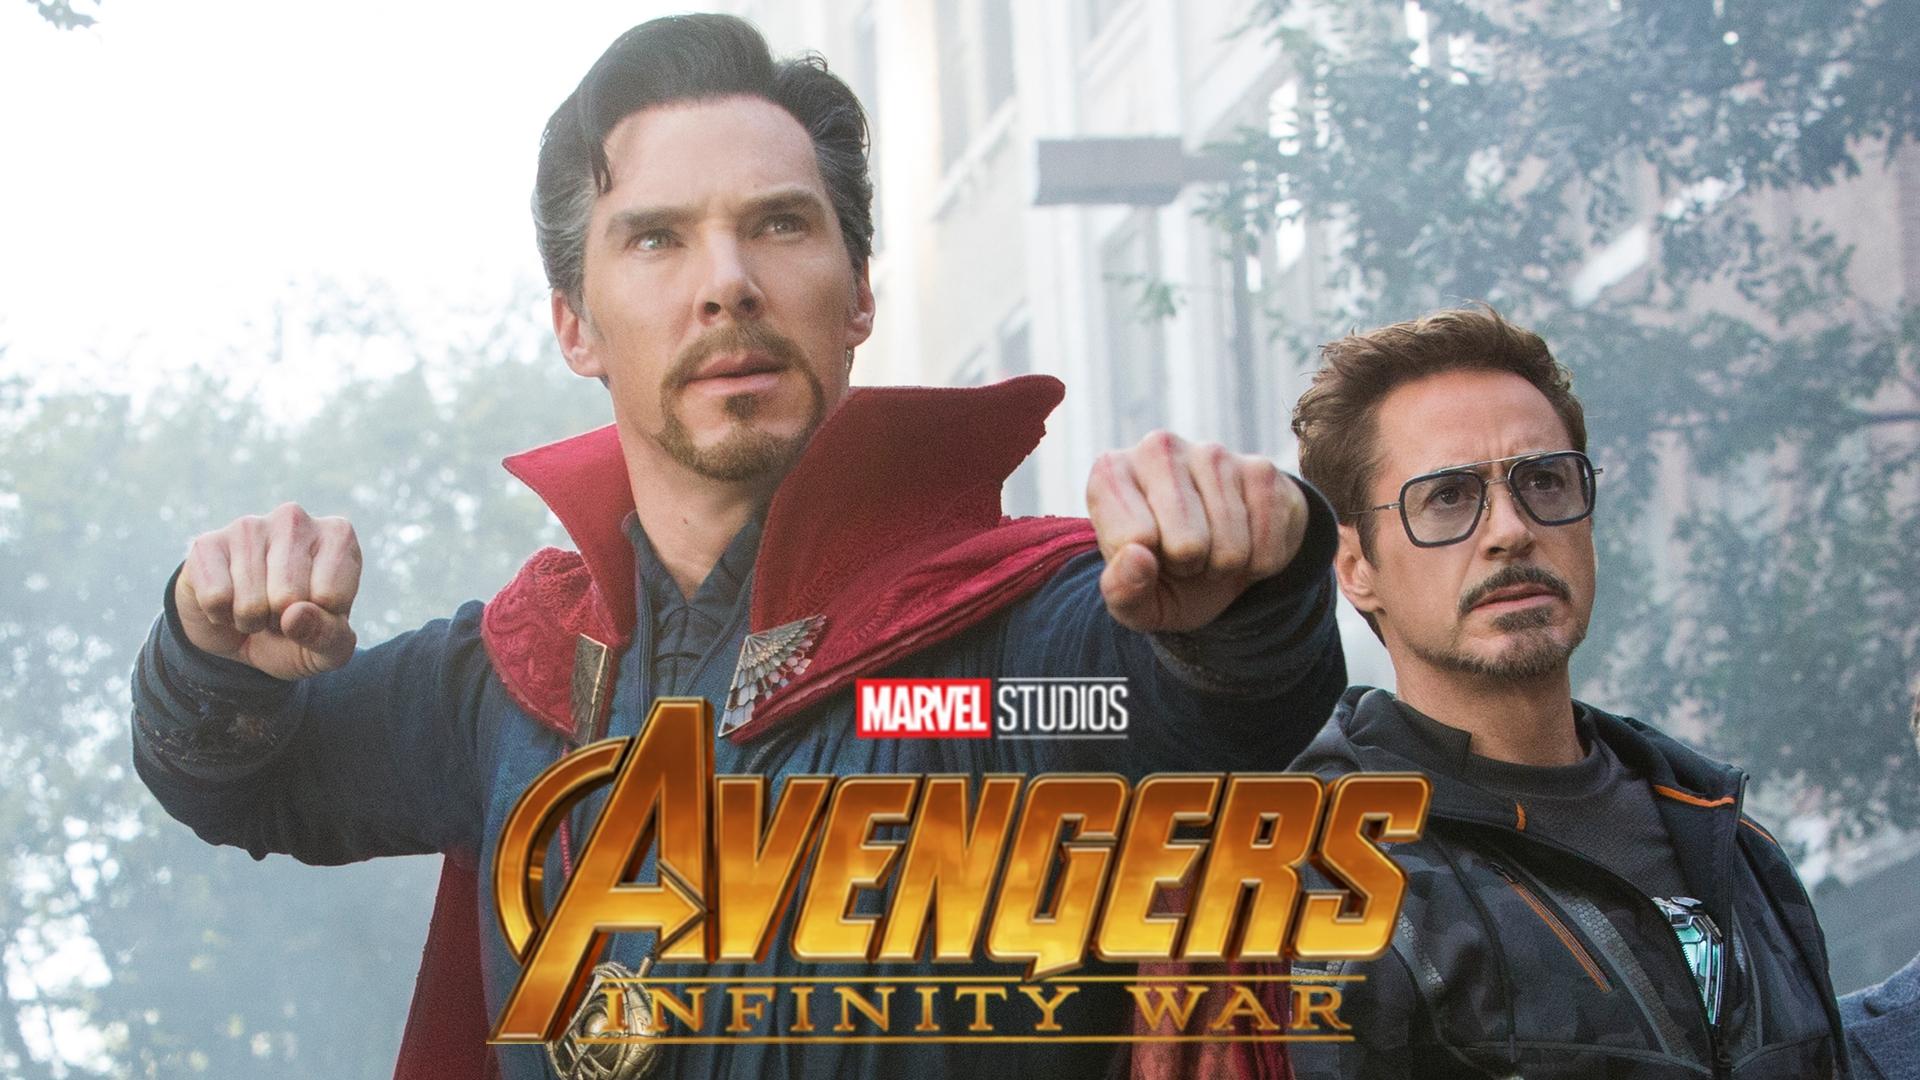 AIW featured Dr Strange Stark